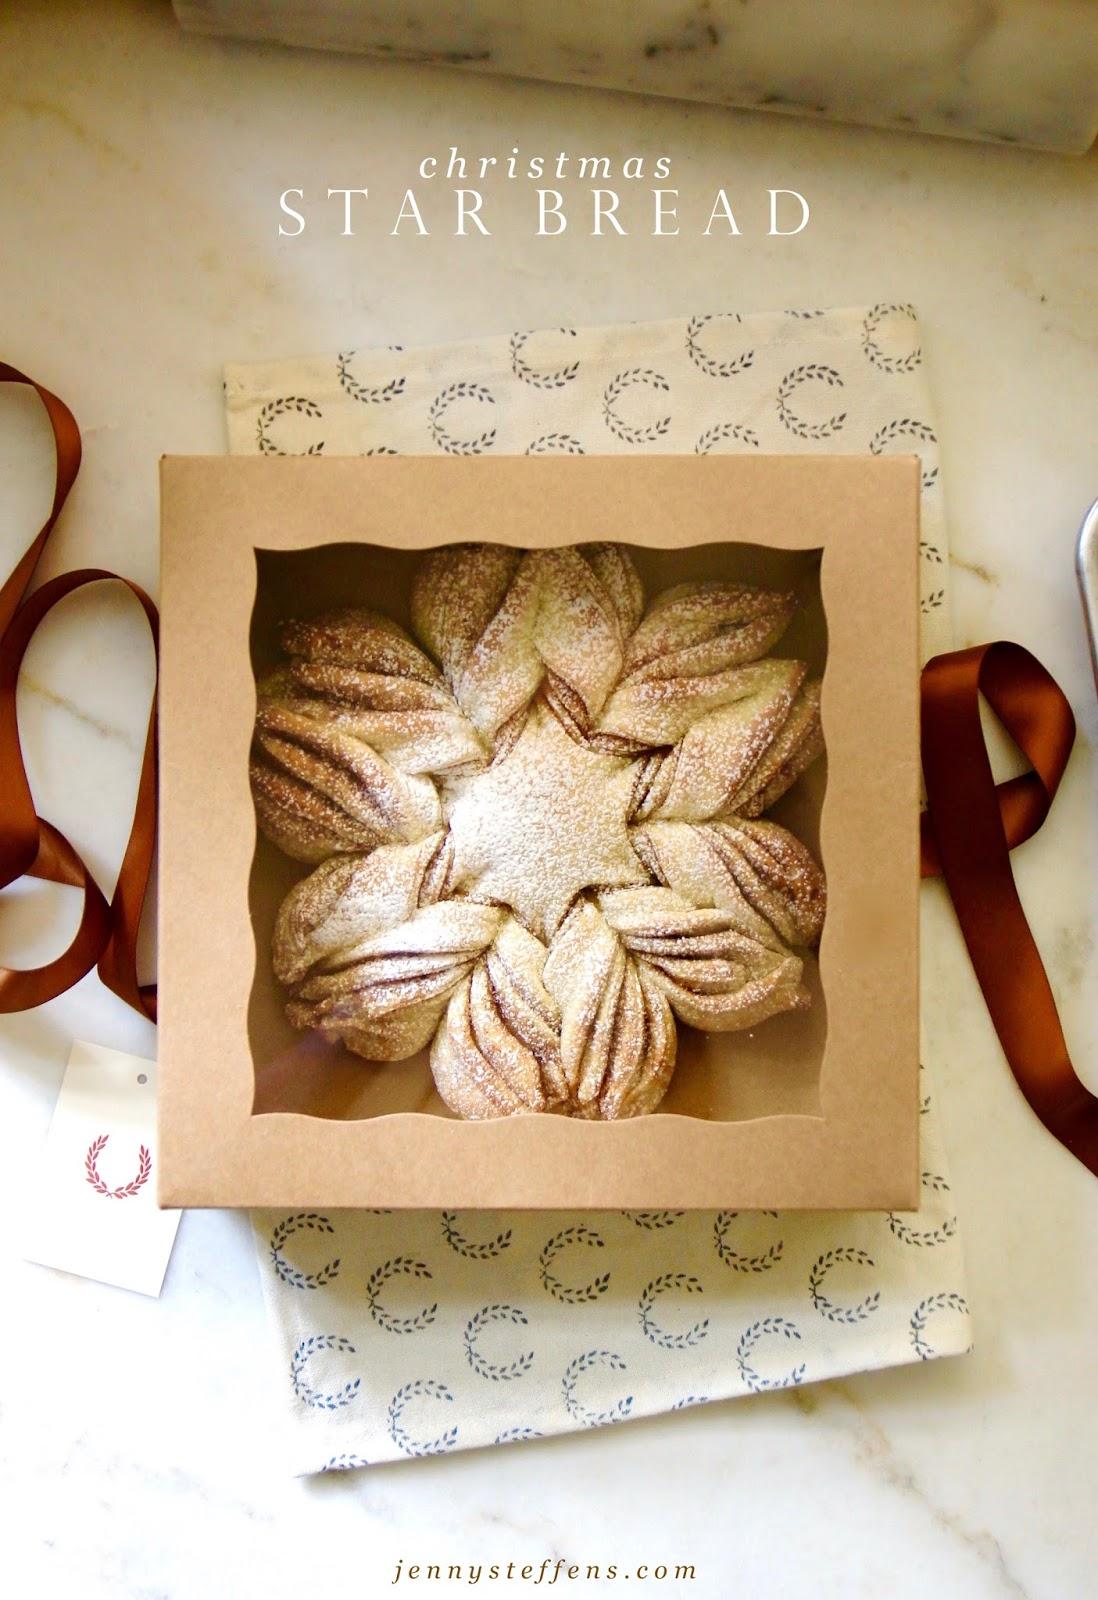 Jenny Steffens Hobick New Holiday Baking Ideas Christmas Star